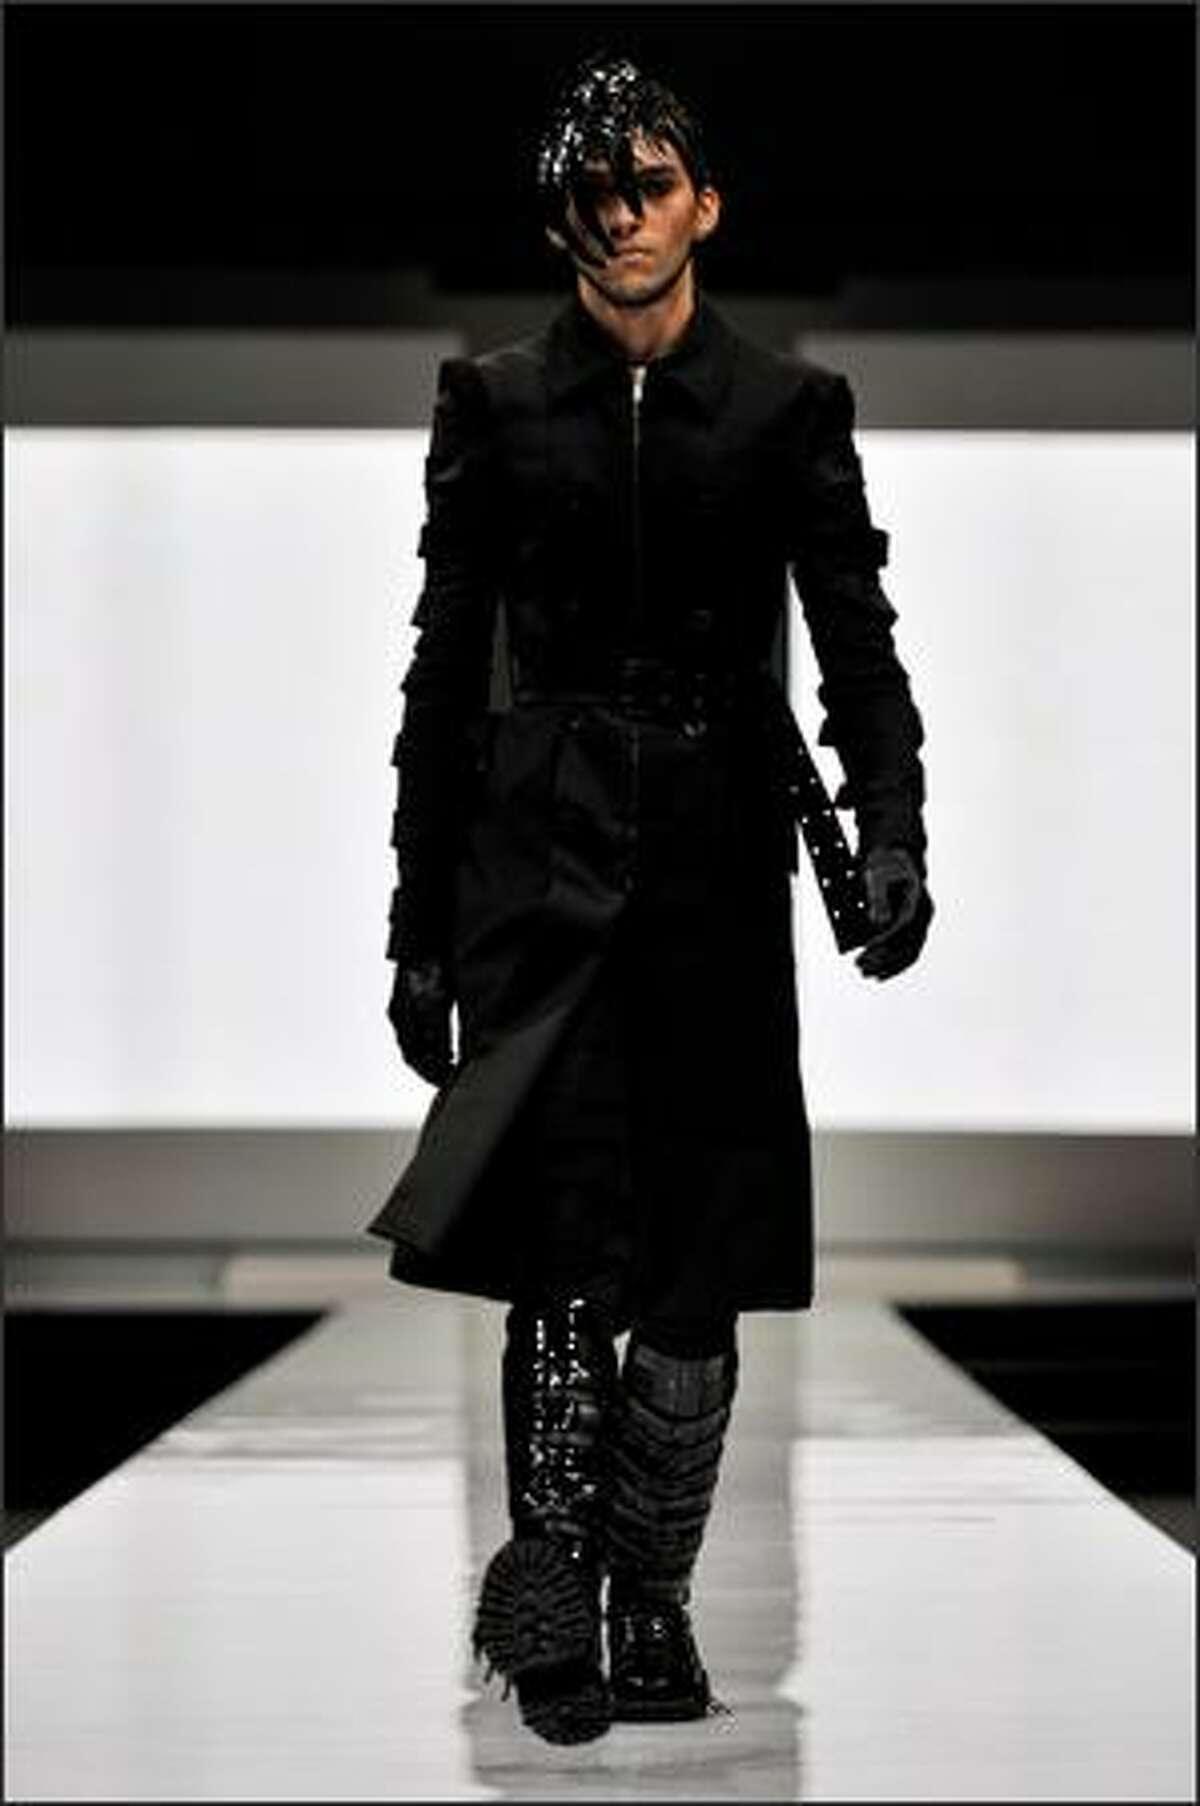 A model walks the runway wearing designs by Gareth Pugh.